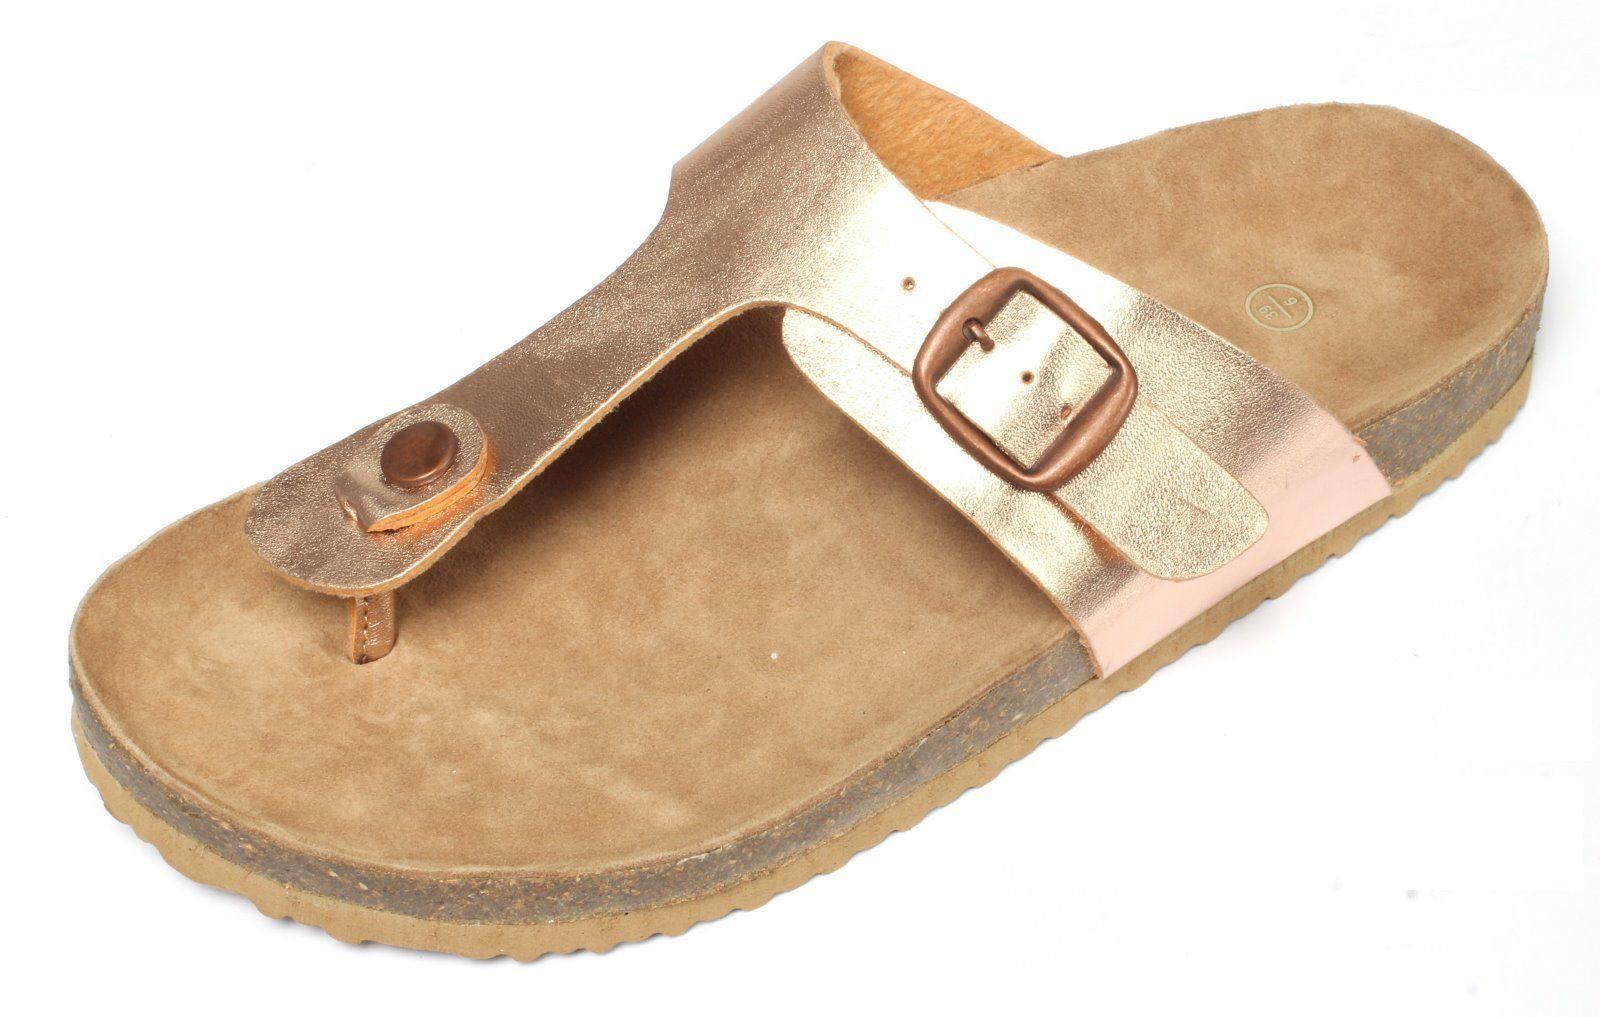 Details zu Damen Bio Zehentrenner rose gold Gr. 37 41 Pantoletten Sandalen Slipper Clogs